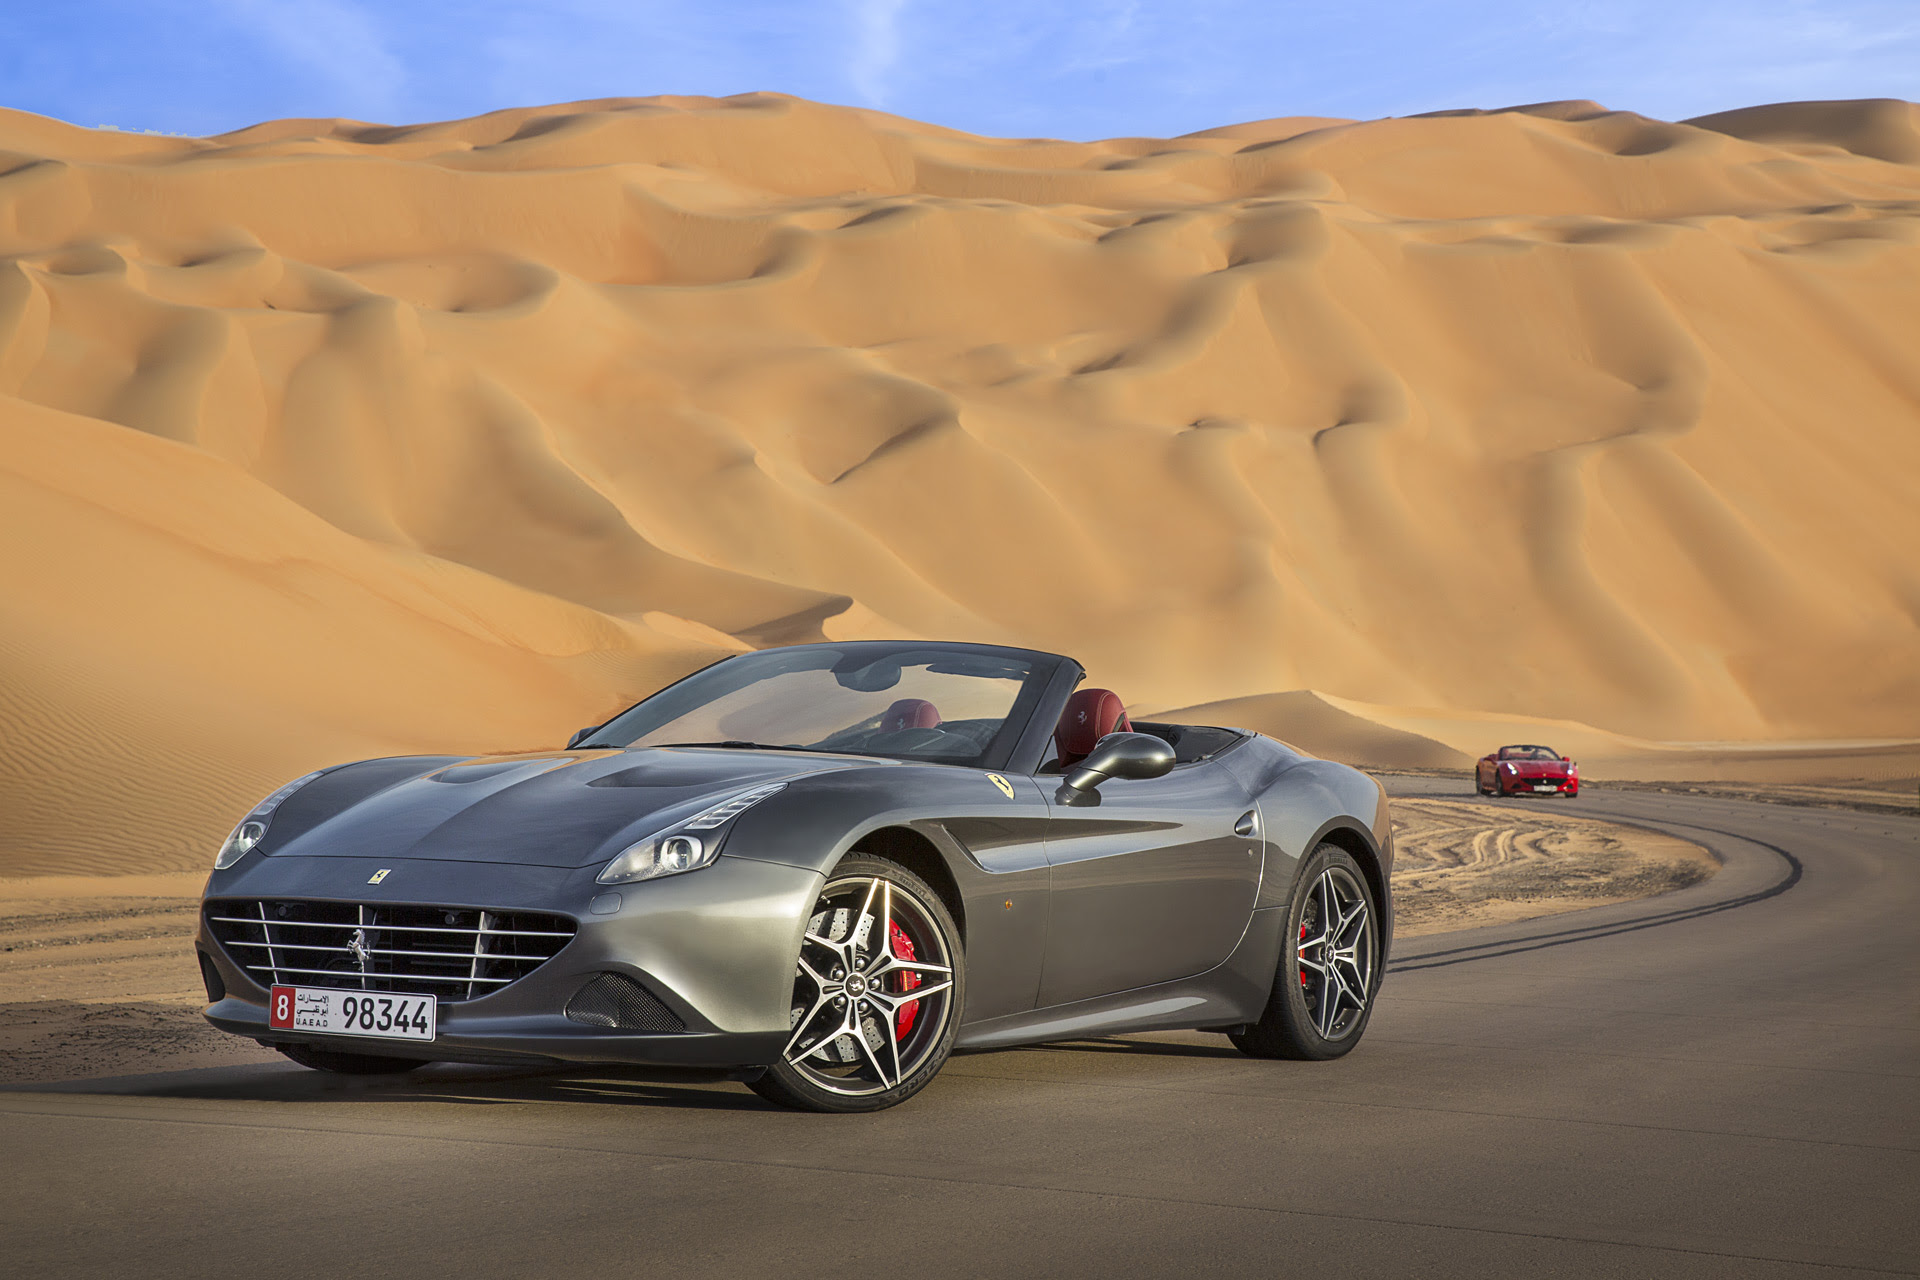 2016 Ferrari California Review, Ratings, Specs, Prices ...